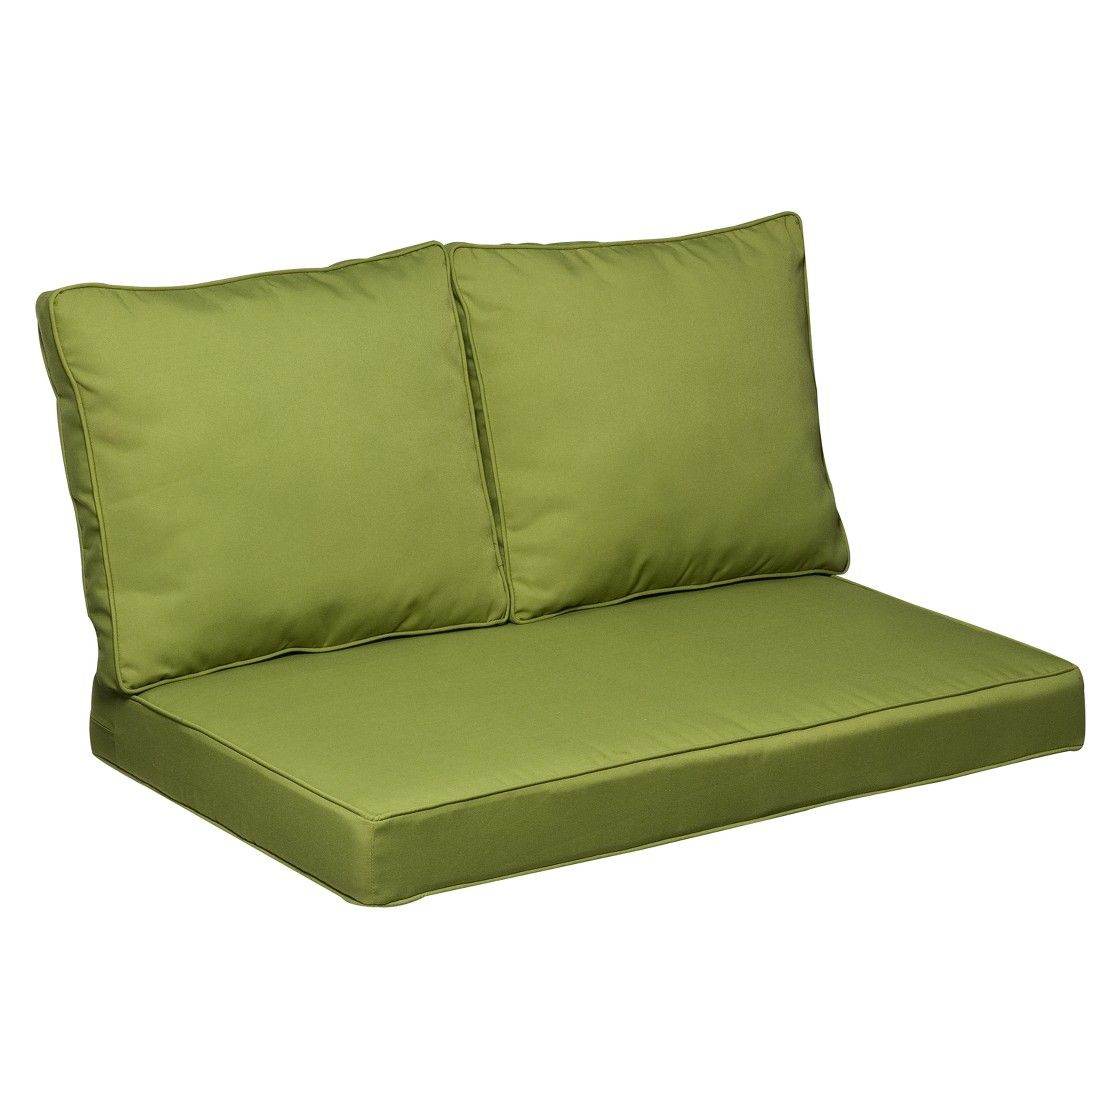 Belmont 3 Piece Brown Wicker Loveseat Replacement Cushion